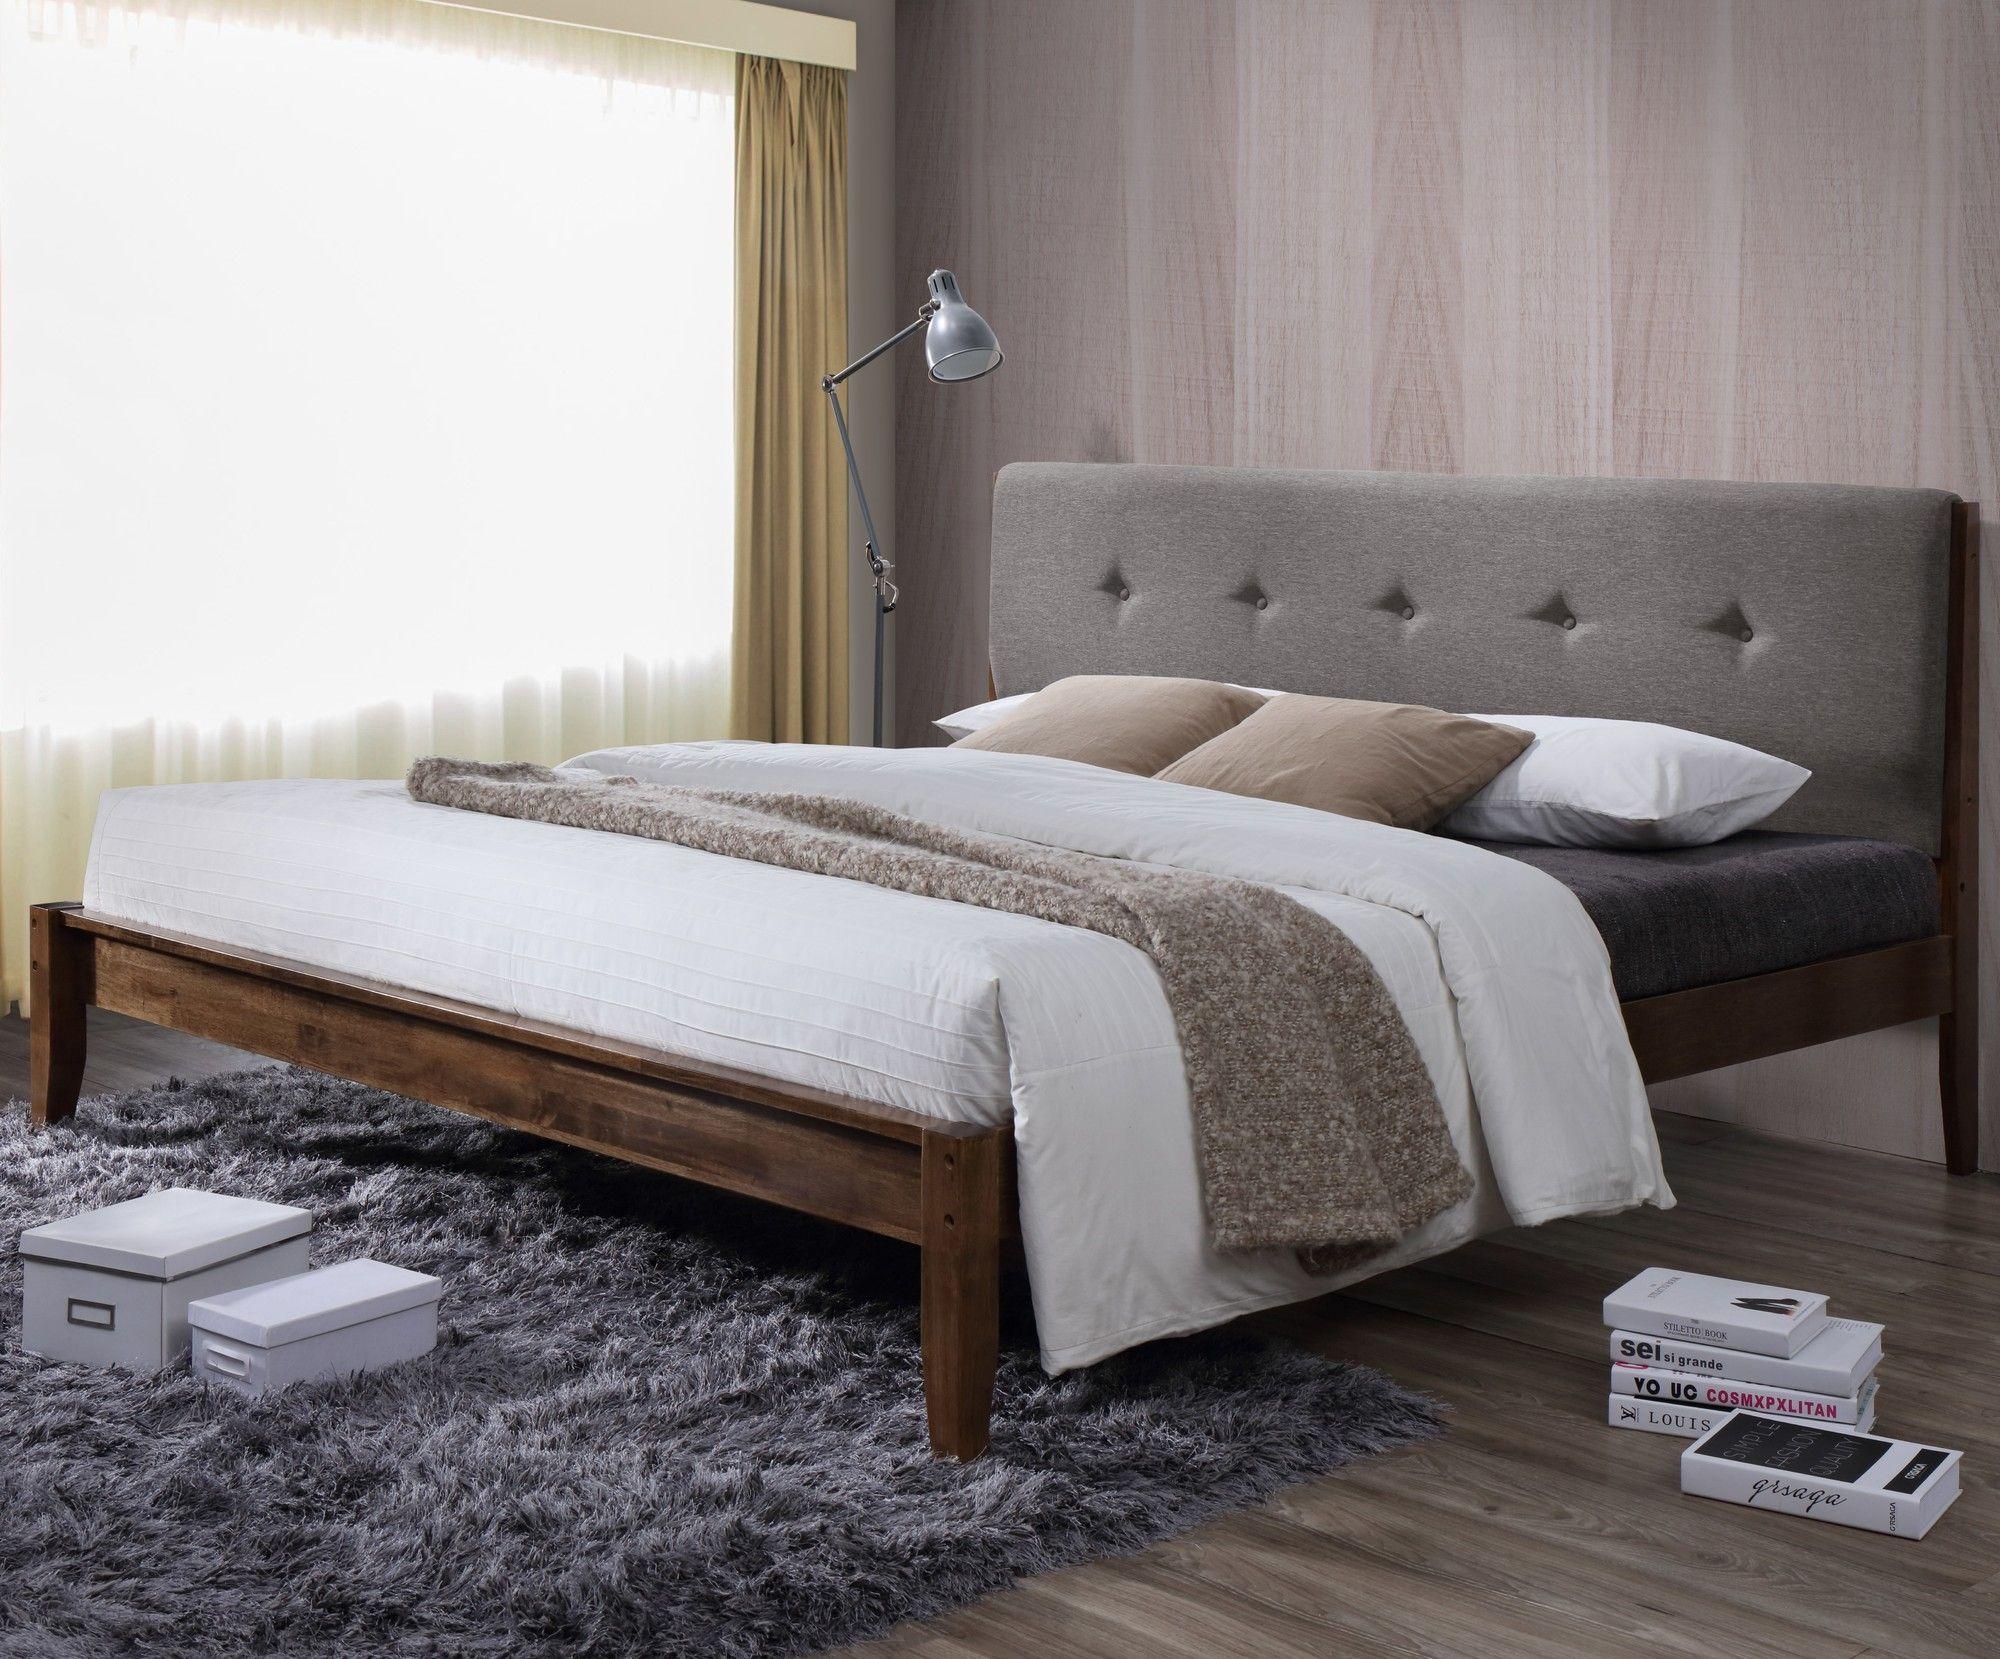 baxton studio rafaele upholstered platform bed upholstered